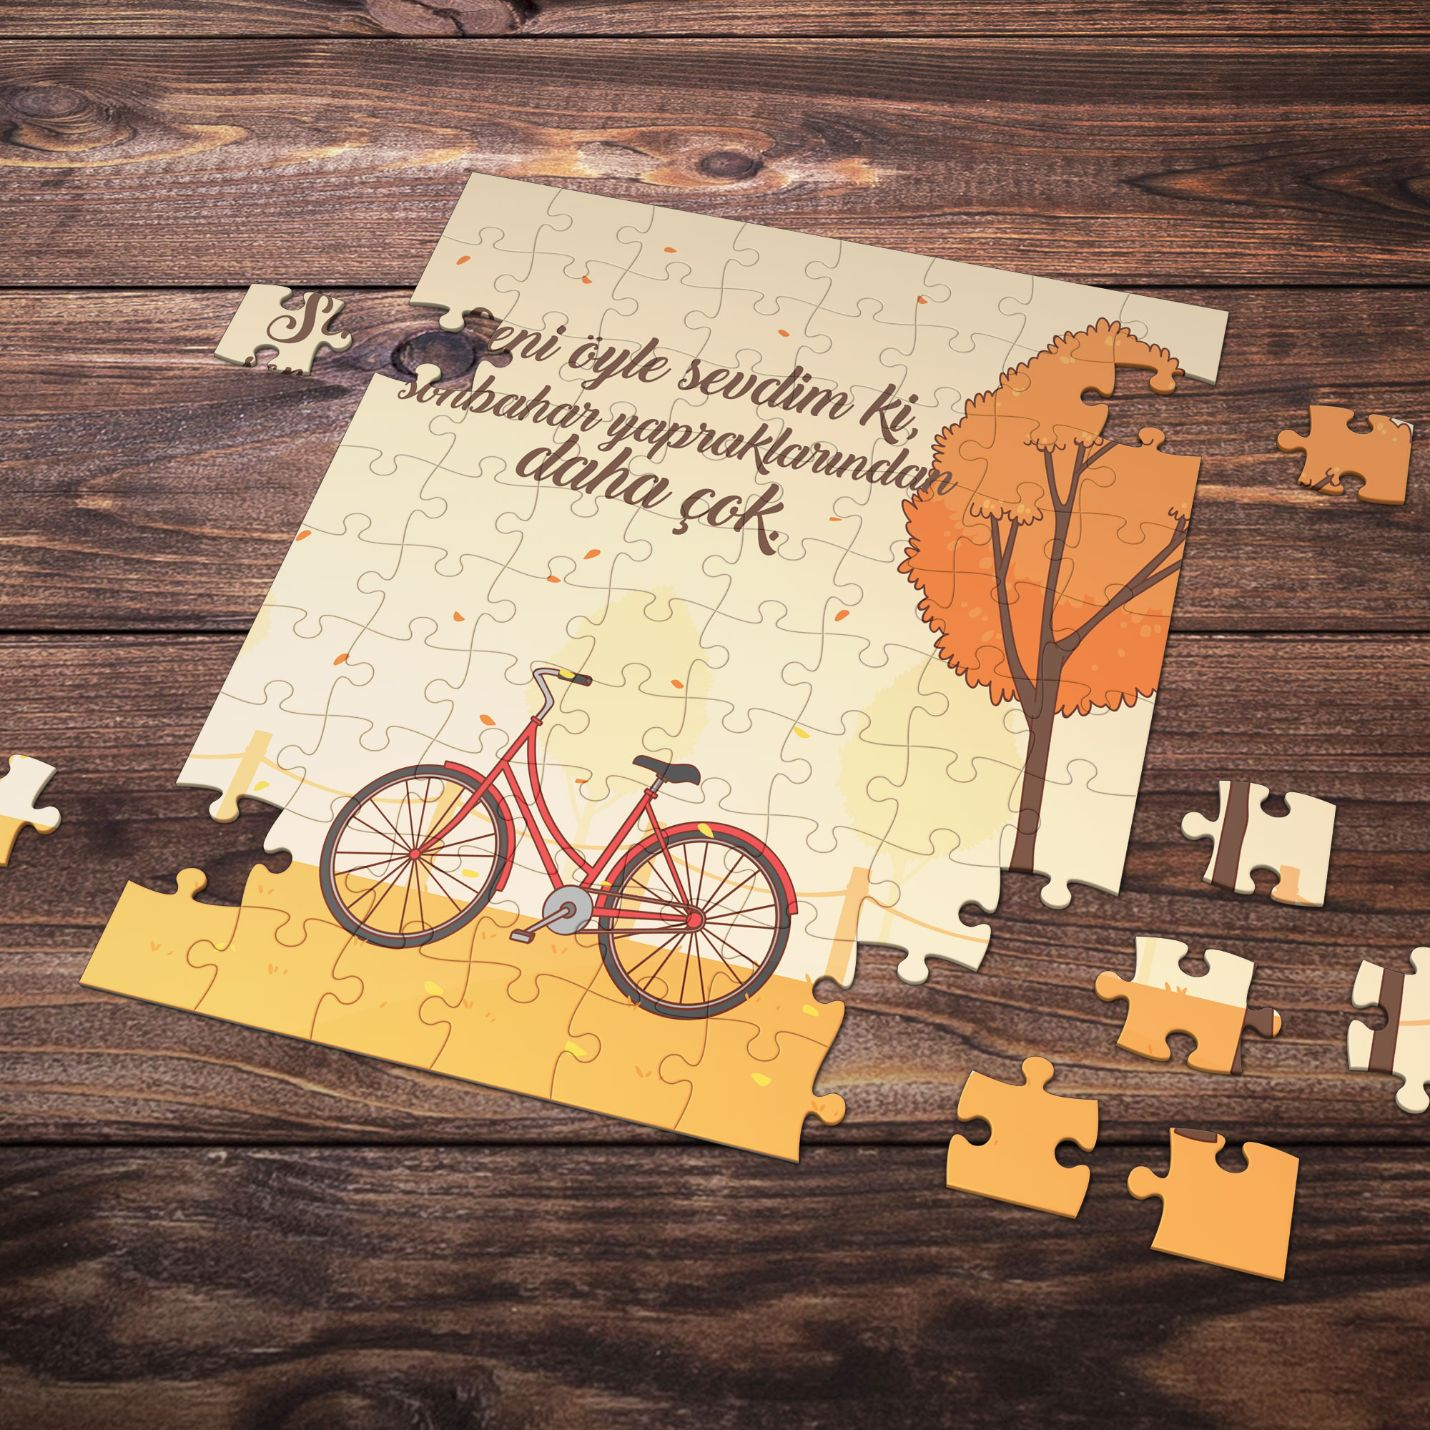 99 Parça Romantik Tasarımlı Puzzle Yapboz No14